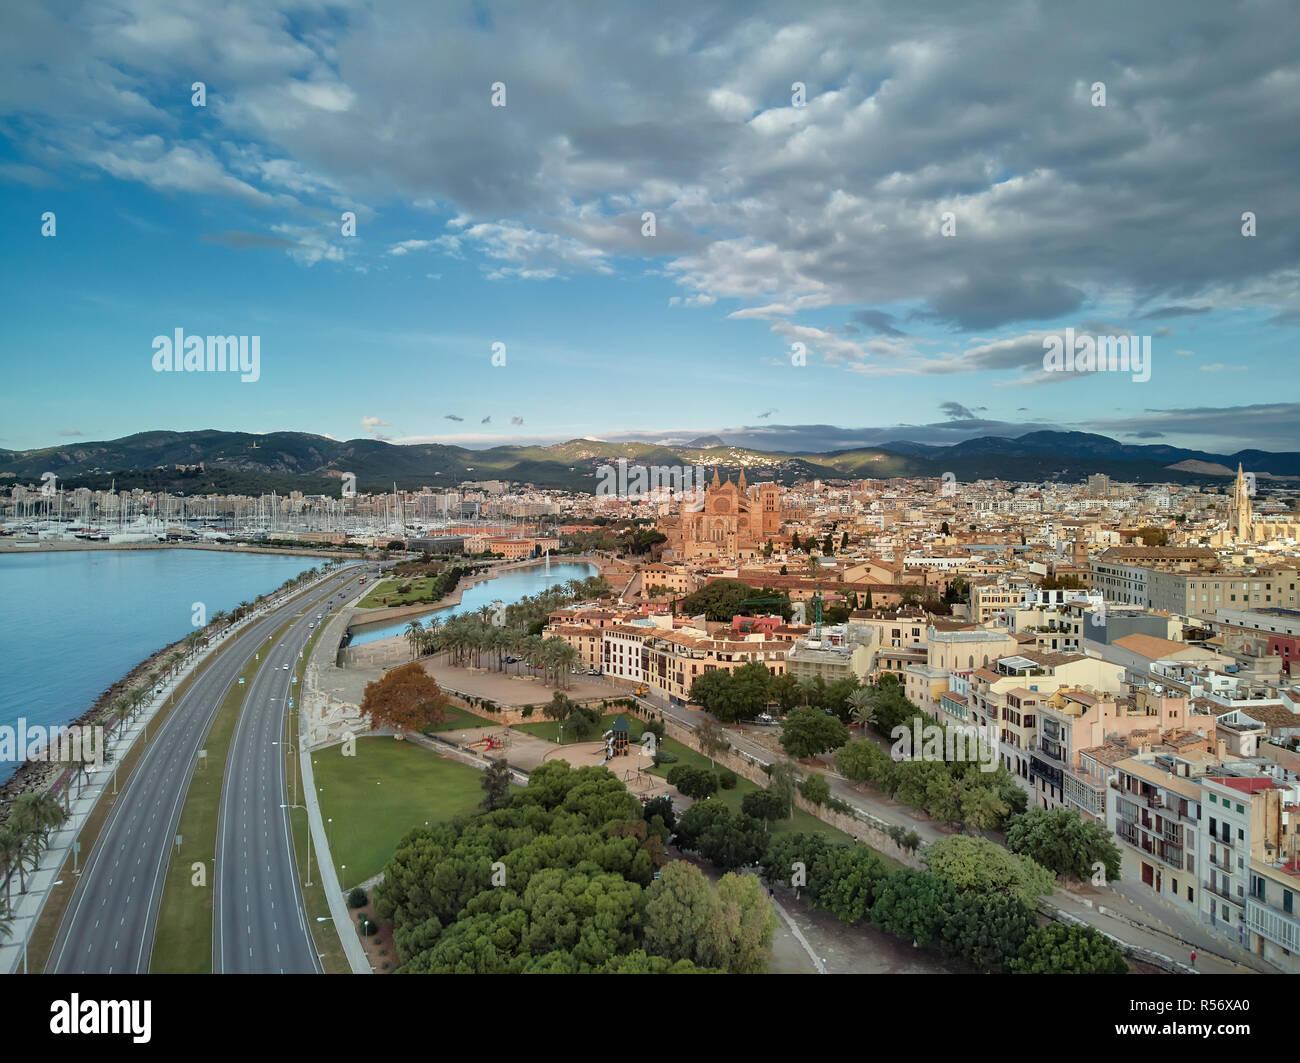 Aerial drone view Majorca cityscape, road along the coast of Mediterranean sea and famous Cathedral of Palma de Mallorca or Le Seu. Spain - Stock Image